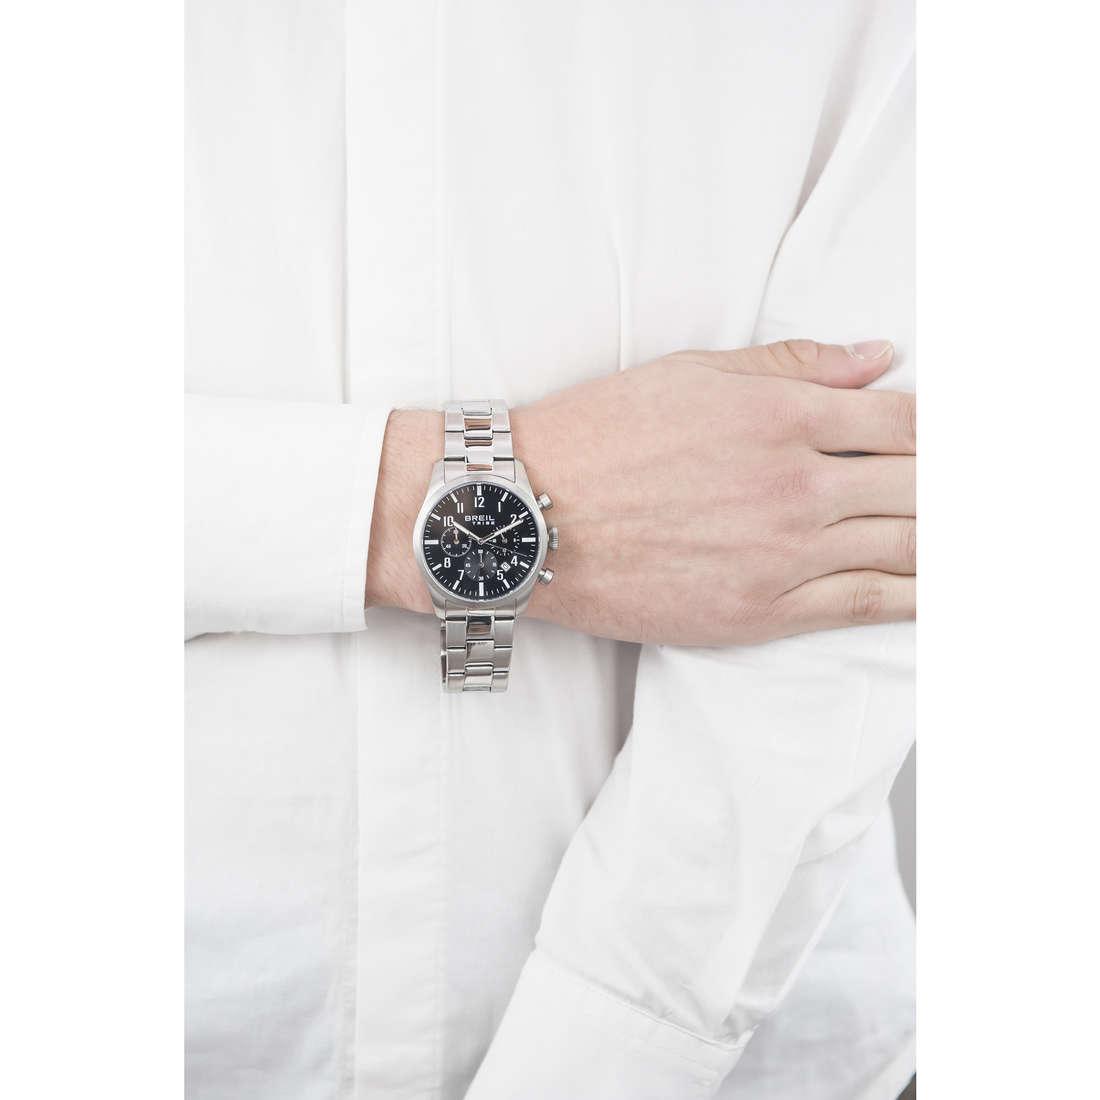 Breil cronografi Classic Elegance Extension uomo EW0227 indosso